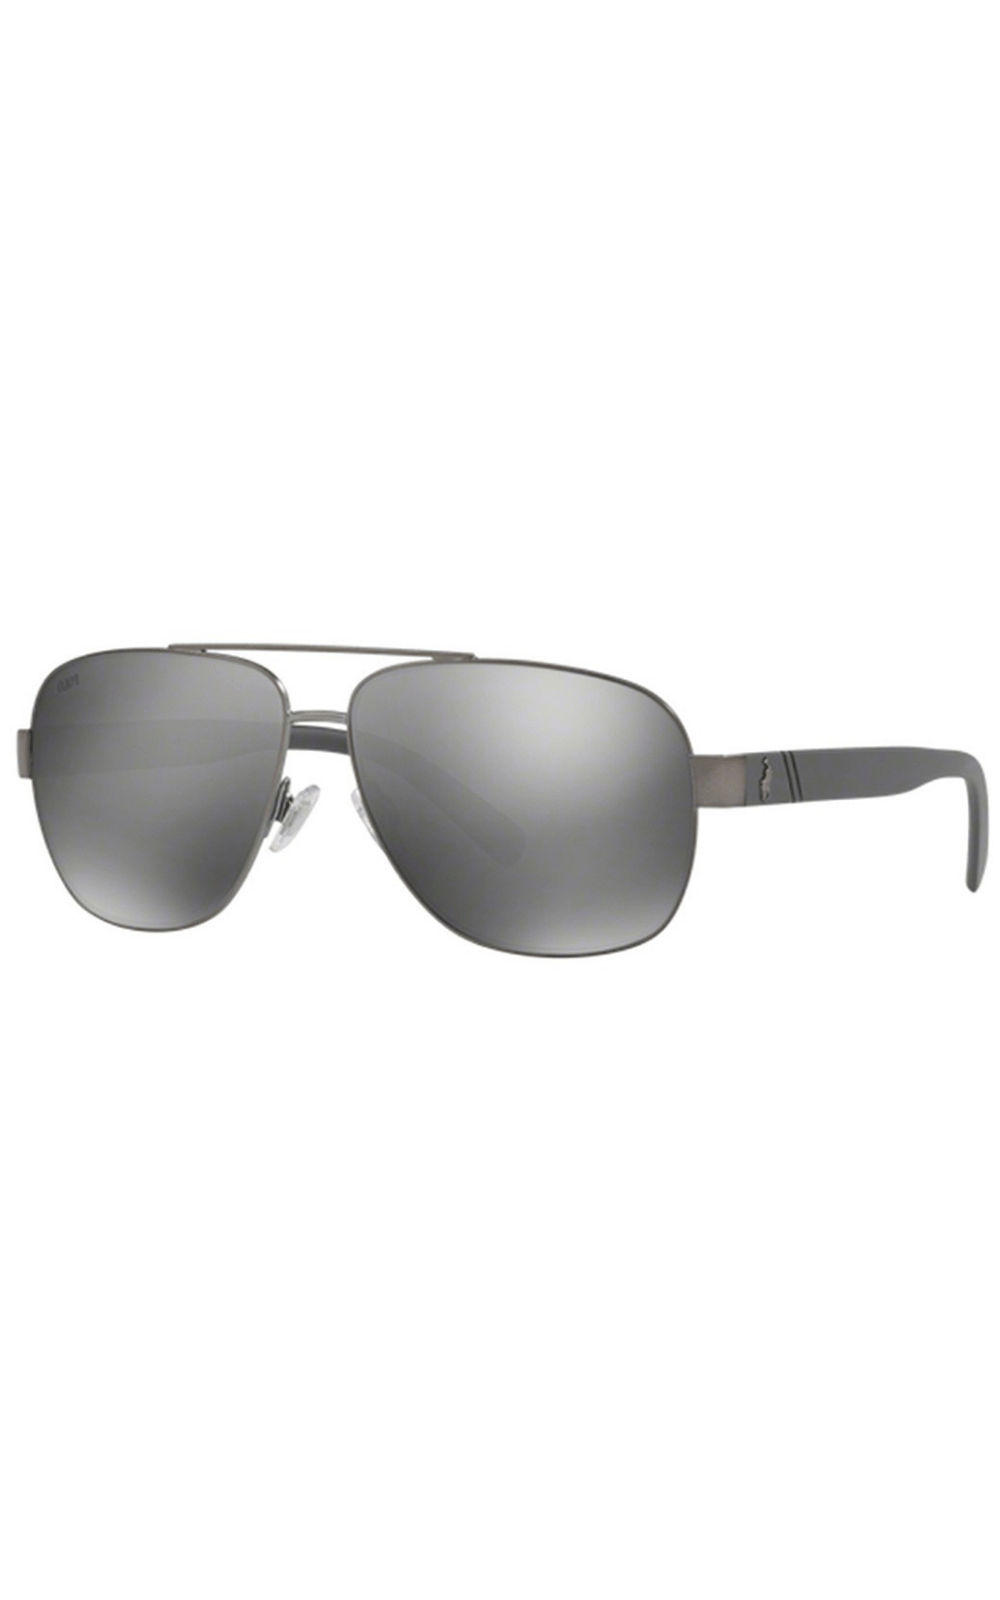 Foto 1 - Óculos De Sol Polo Ralph Lauren 3110 9157/6G